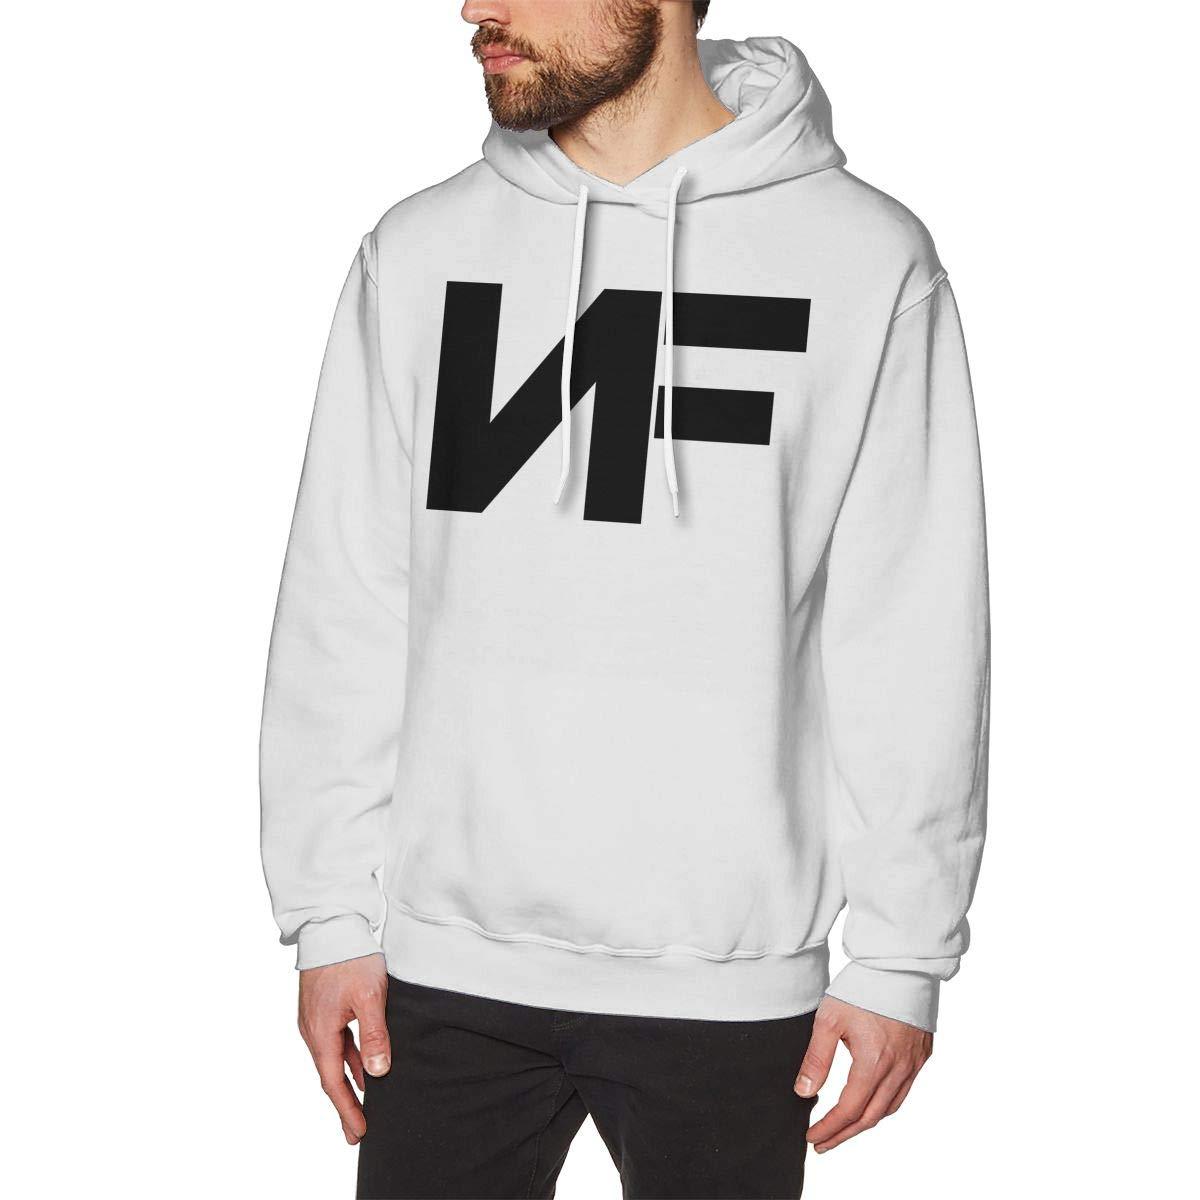 Men's NF Rapper Logo-Logo Hoodie Custom Pullover Sweatshirt Long Sleeve Hoodies Hooded for Youth Boys Men White 2XL by Cxcai